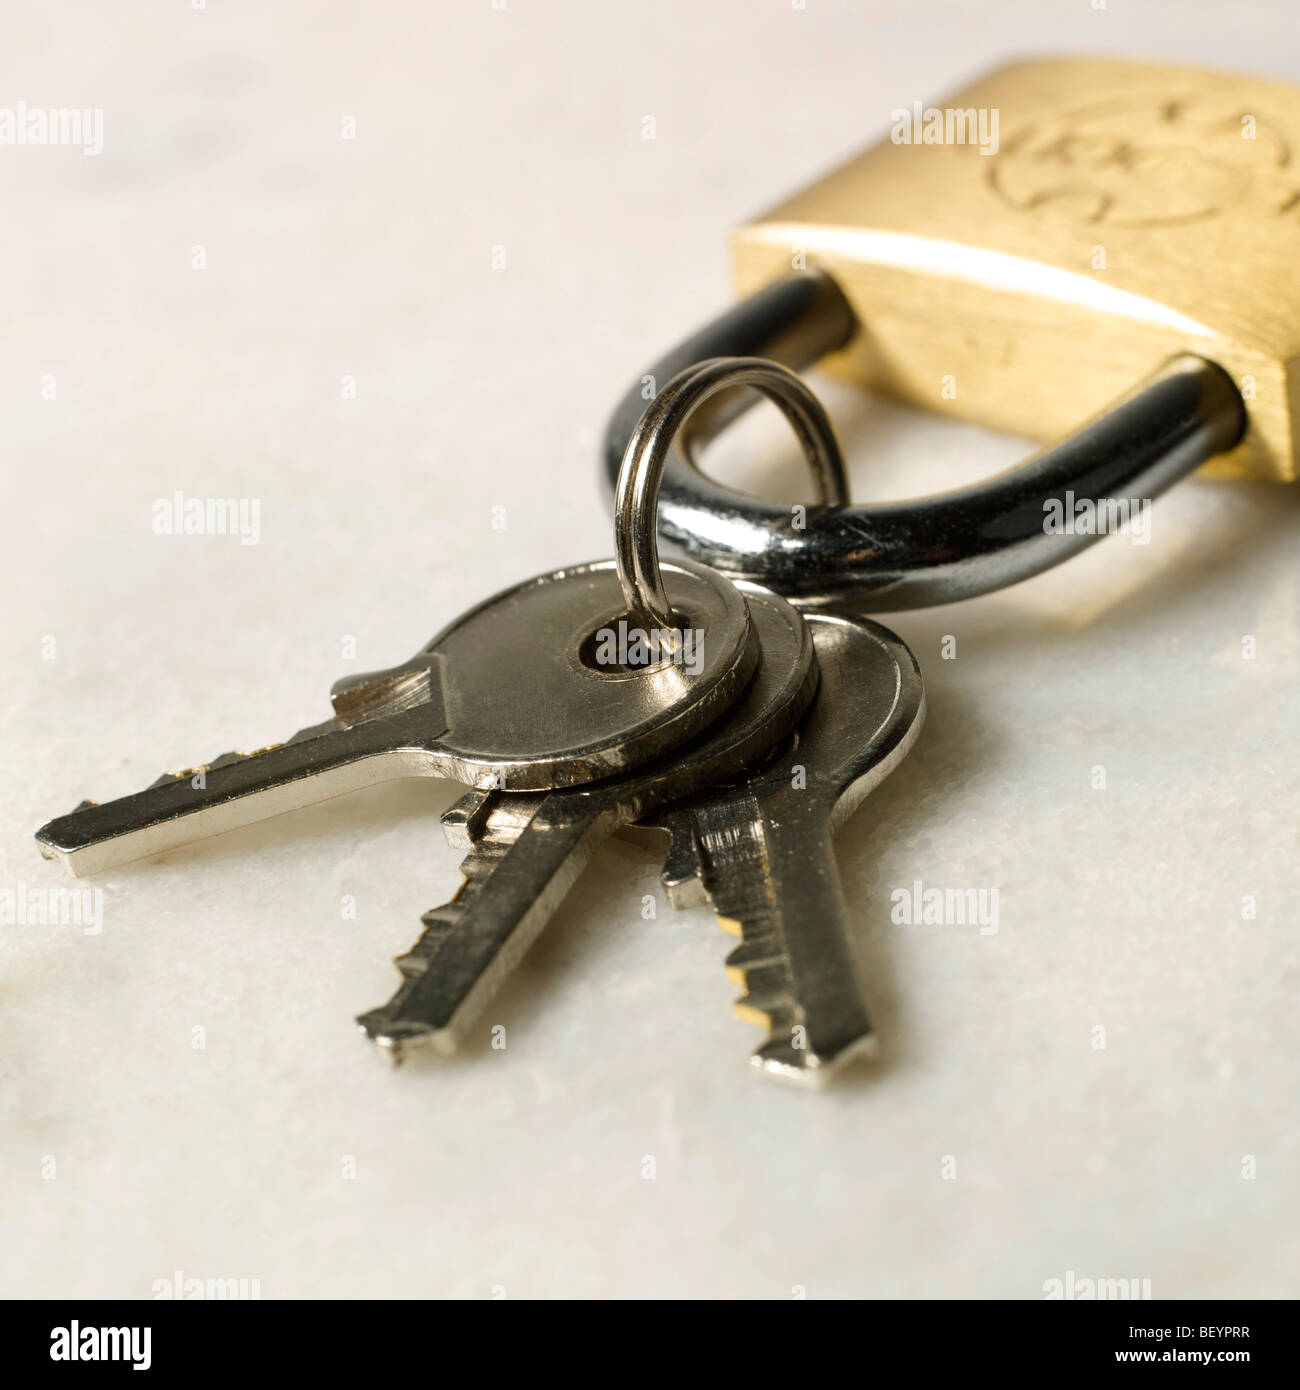 Padlock with three keys. - Stock Image